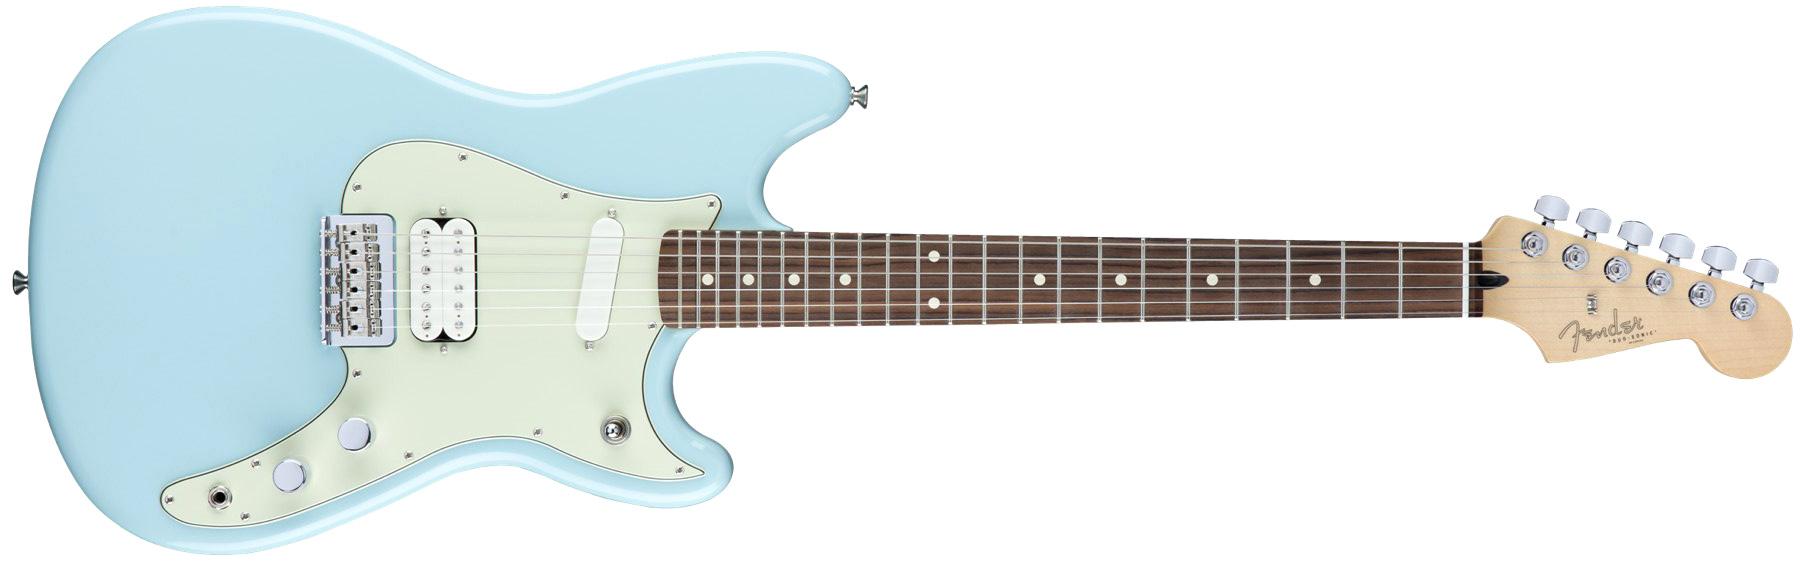 new offset guitars from fender coming october 2016 fat sound. Black Bedroom Furniture Sets. Home Design Ideas